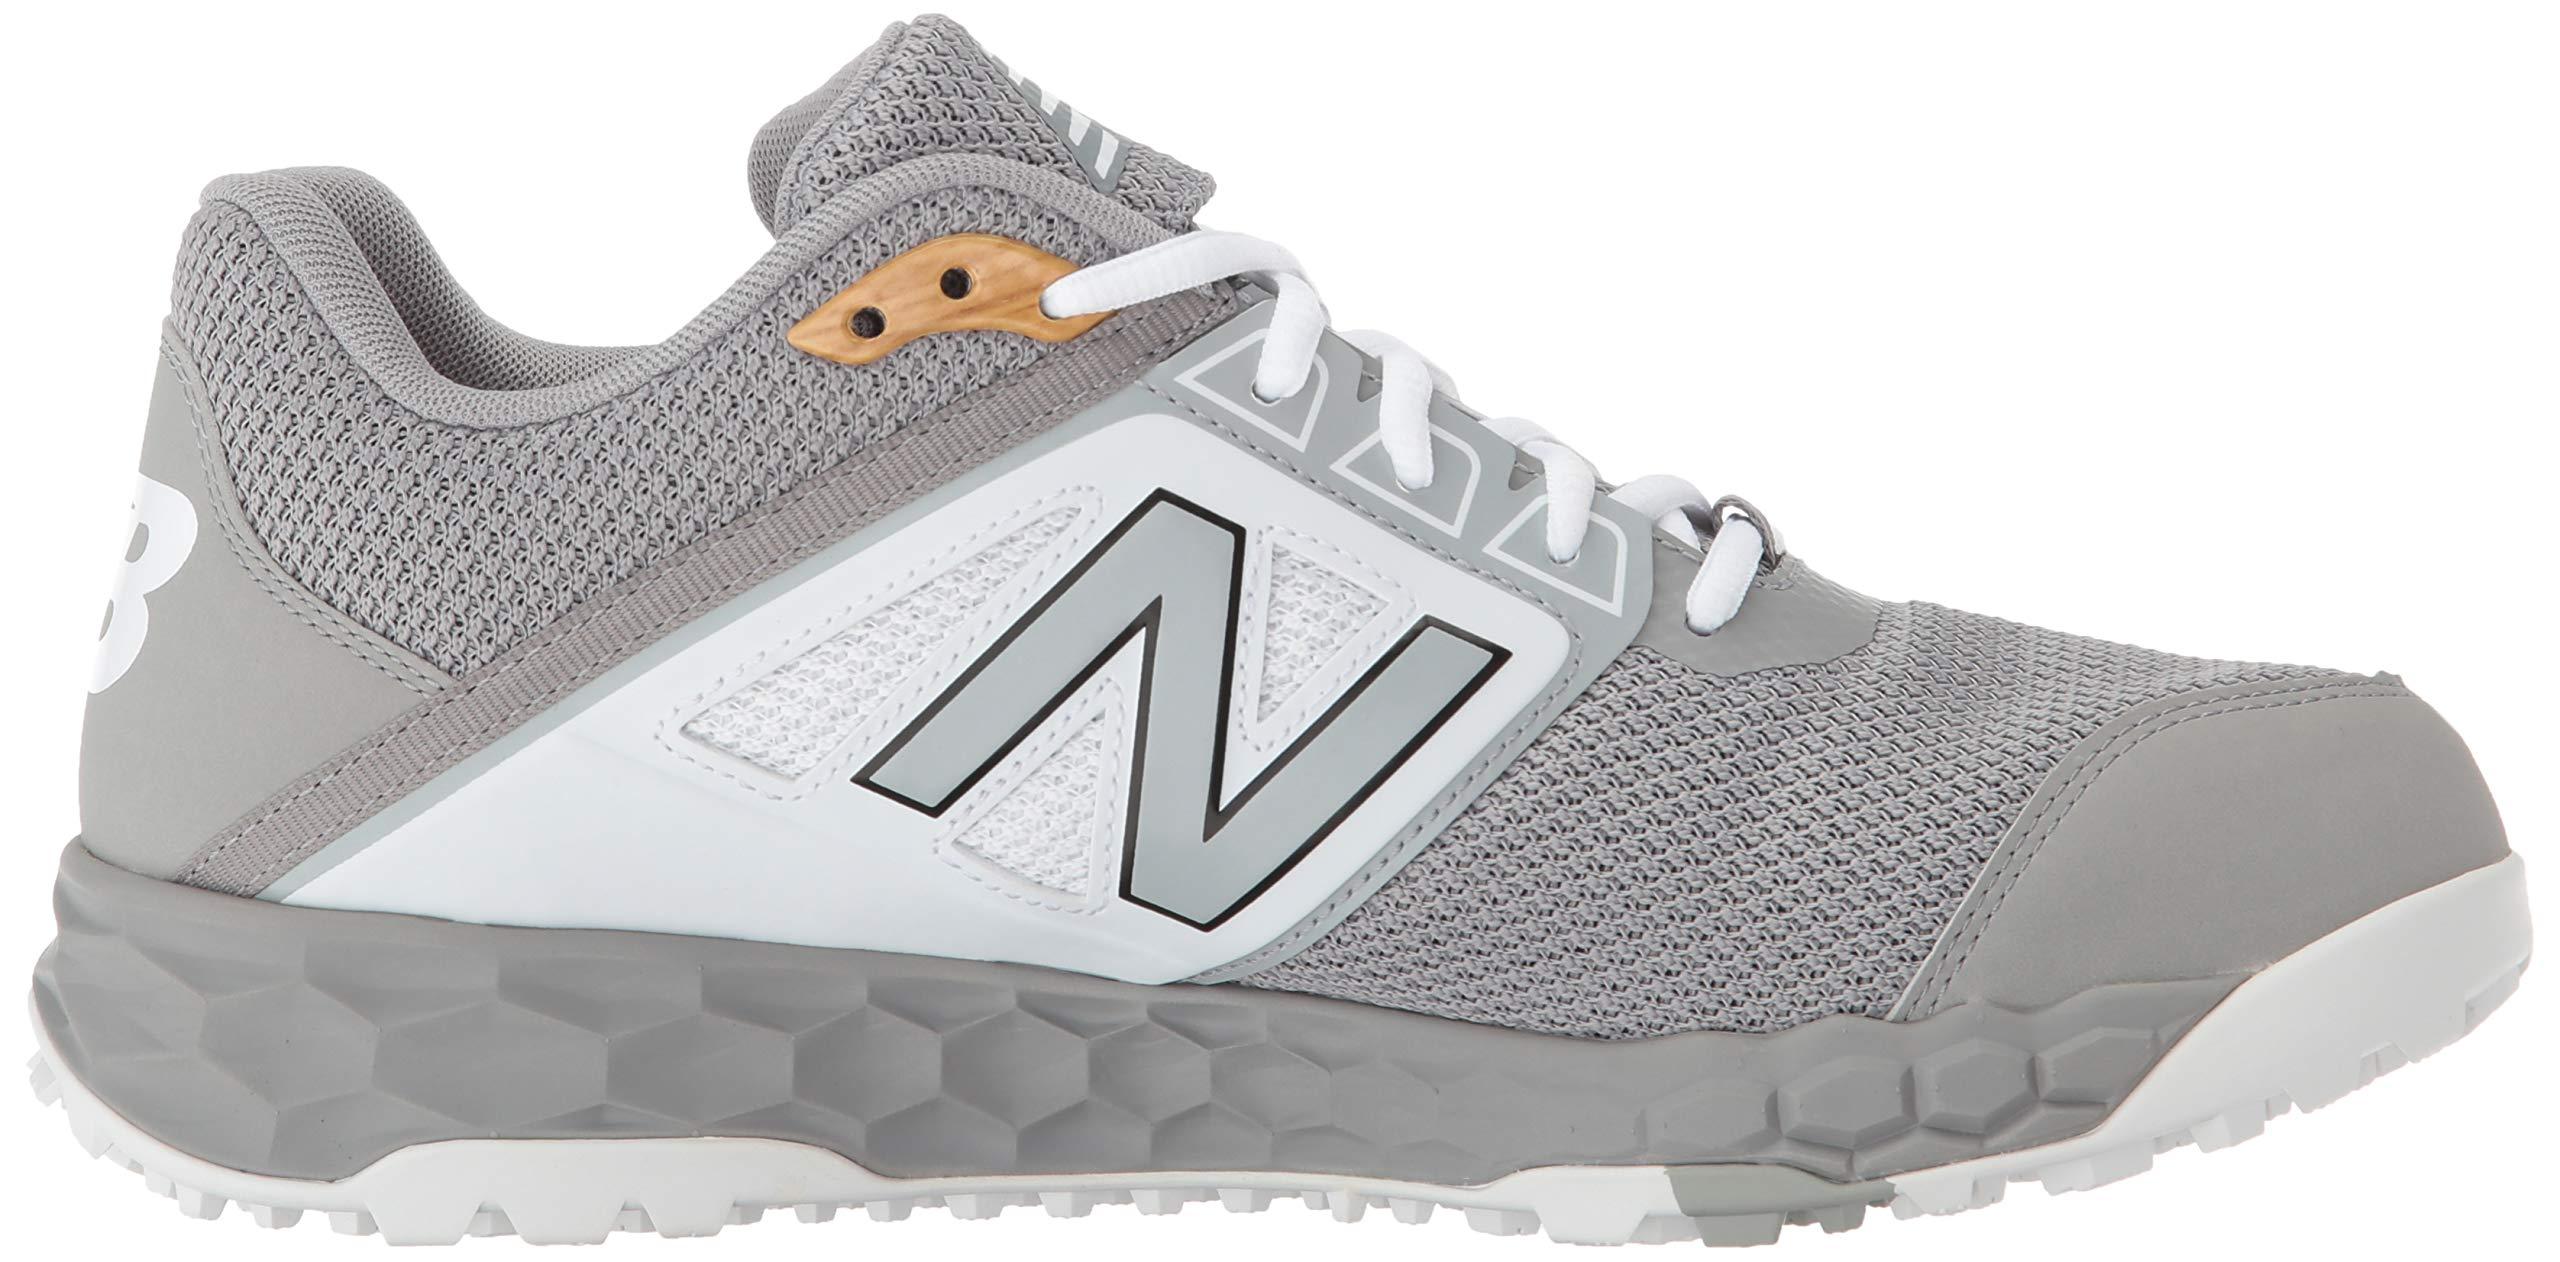 New Balance Men's 3000v4 Turf Baseball Shoe, Grey/White, 5 D US by New Balance (Image #6)